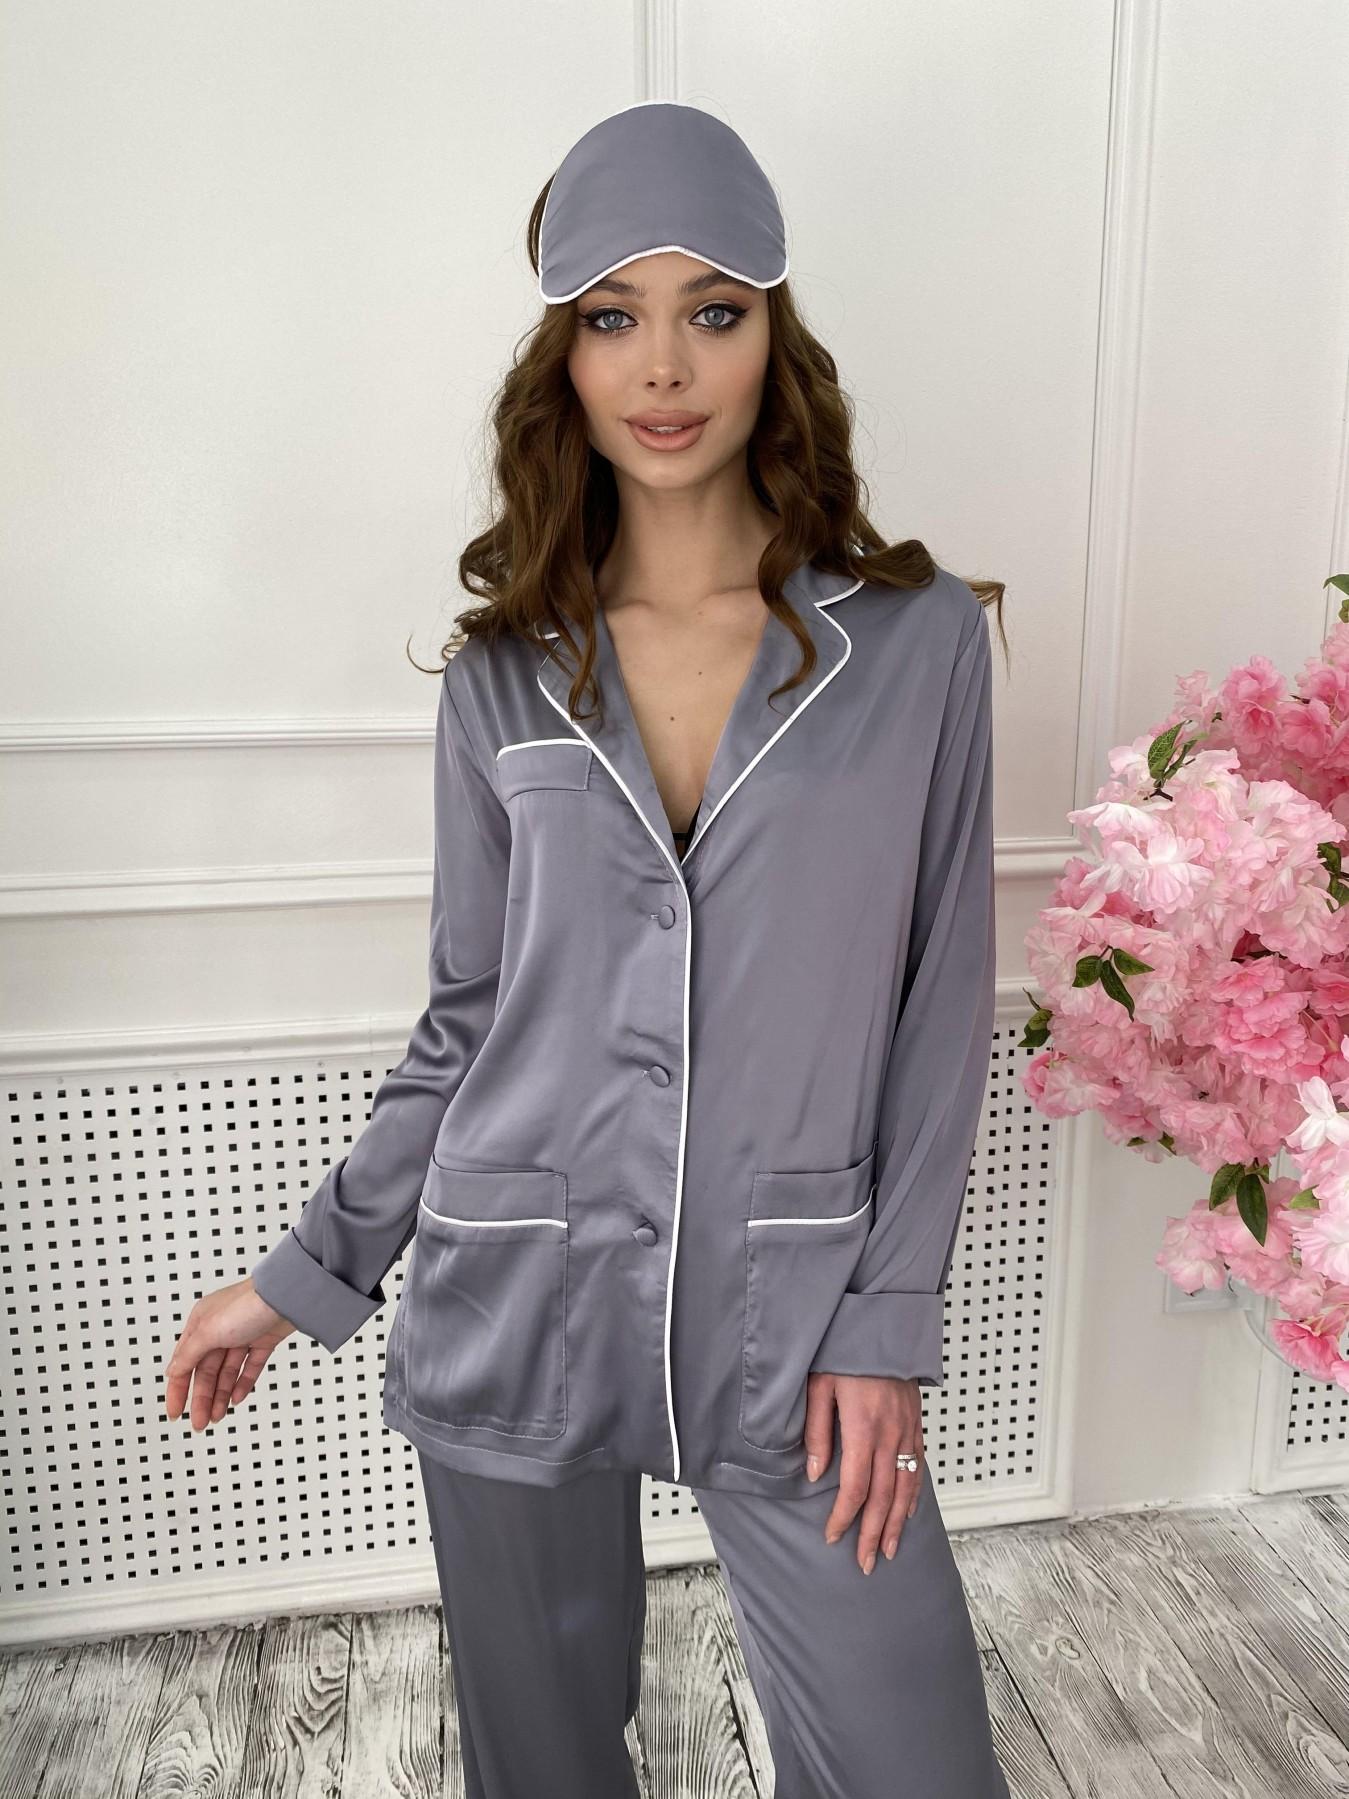 Шайн костюм из шелка  10778 АРТ. 47218 Цвет: темно серый - фото 5, интернет магазин tm-modus.ru